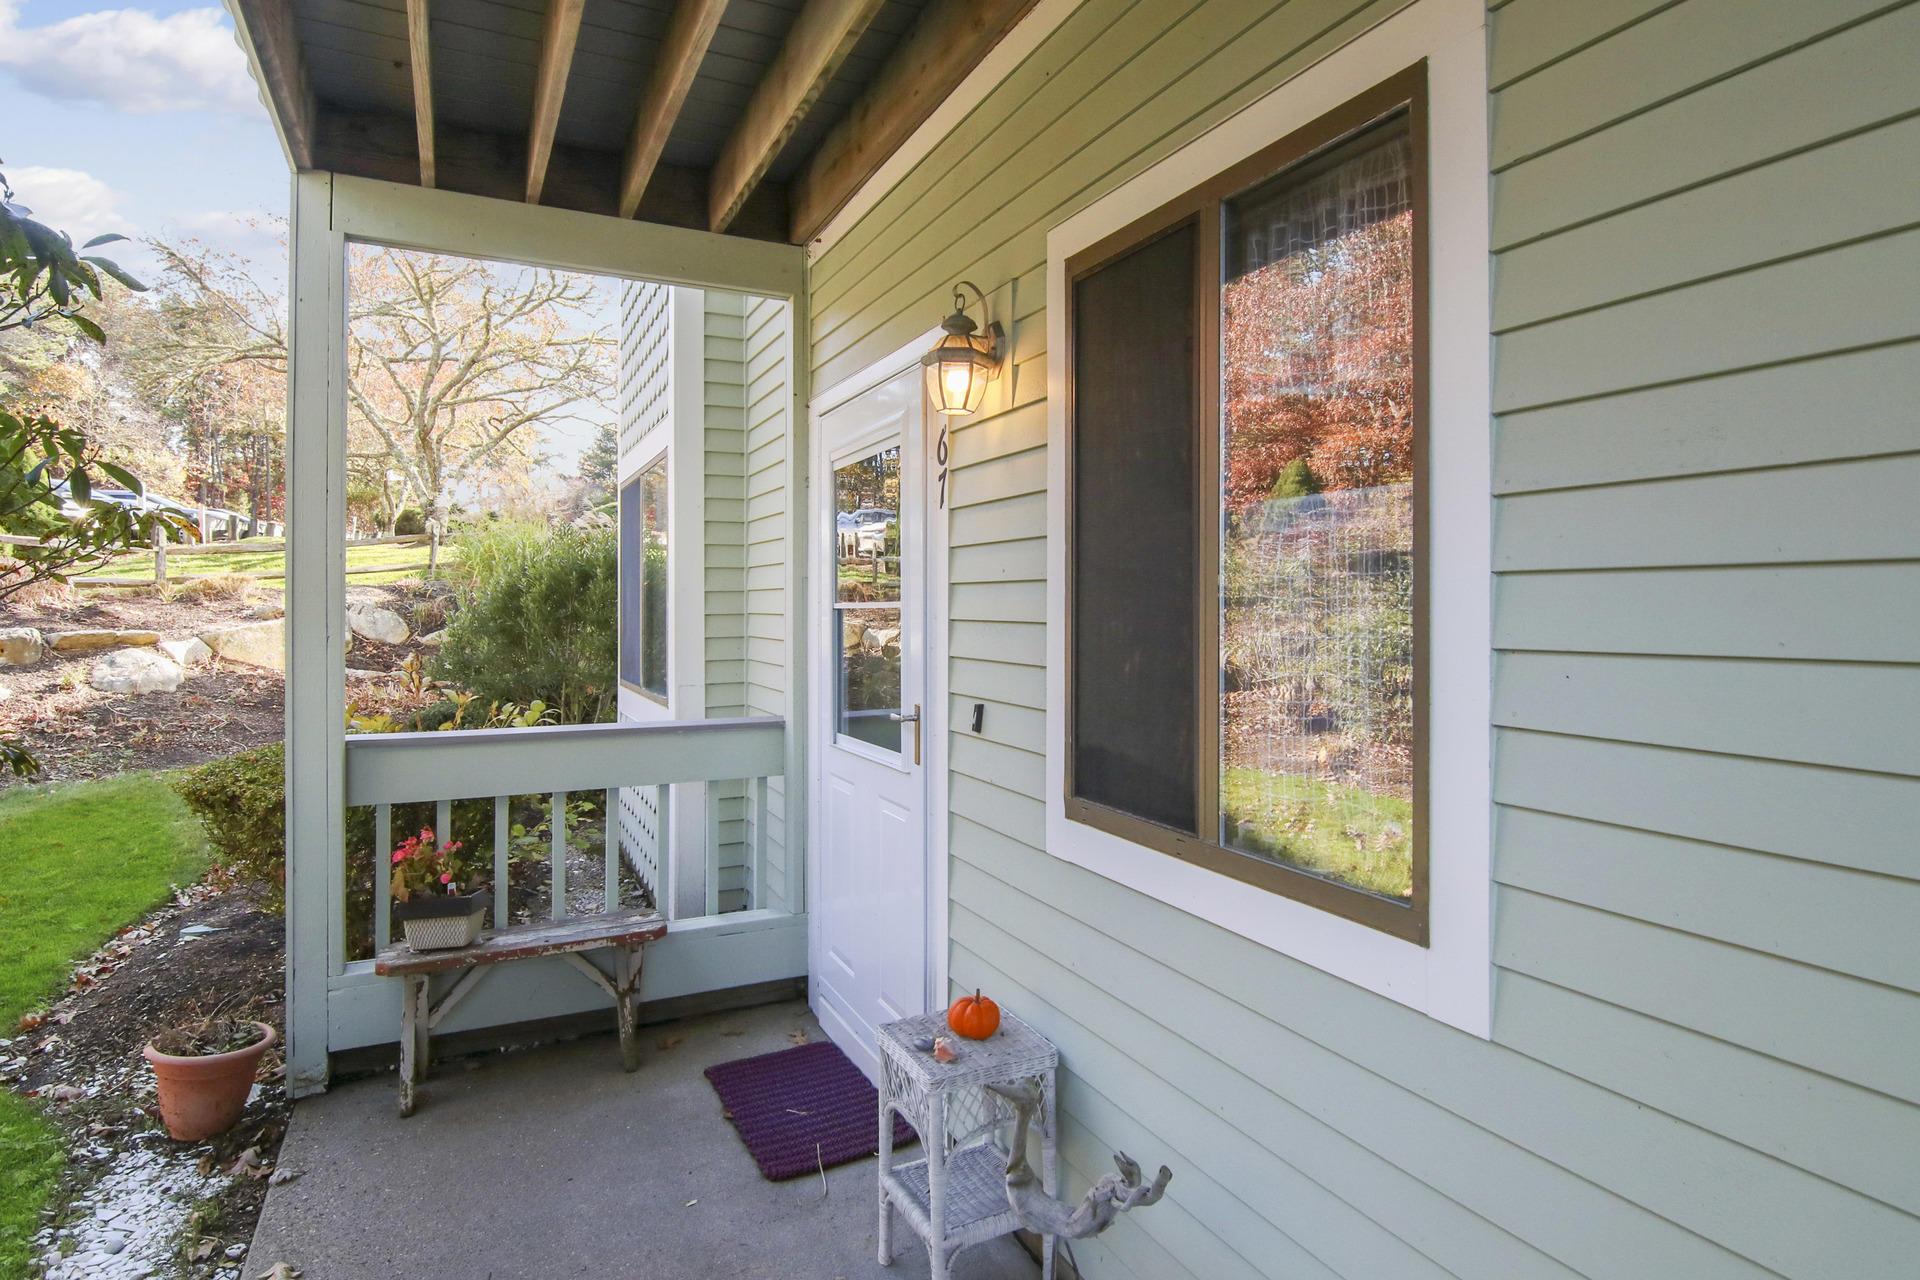 67 Chilton Lane, Brewster MA, 02631 sales details